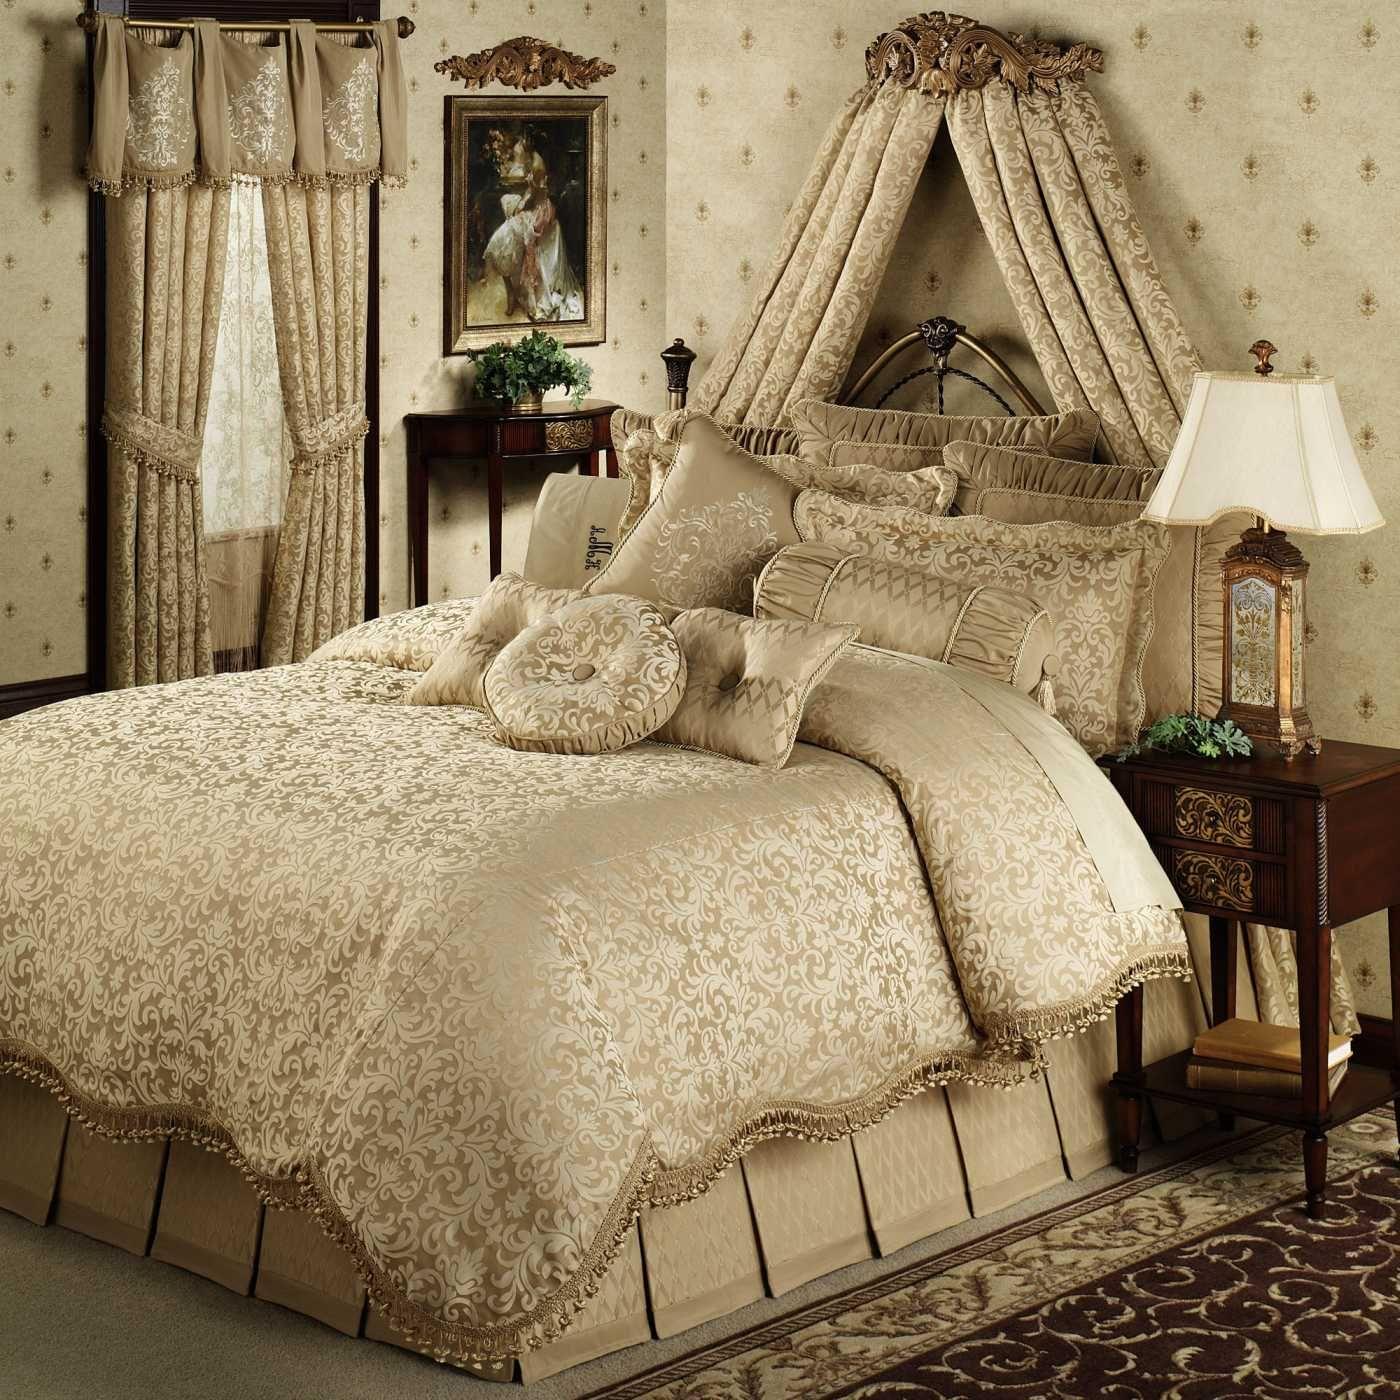 Luxury Bedding Sets Sofia Vergara Bedding Elegant And Glamour Hues Talltreezdesigns Com Kamar Tidur Tidur